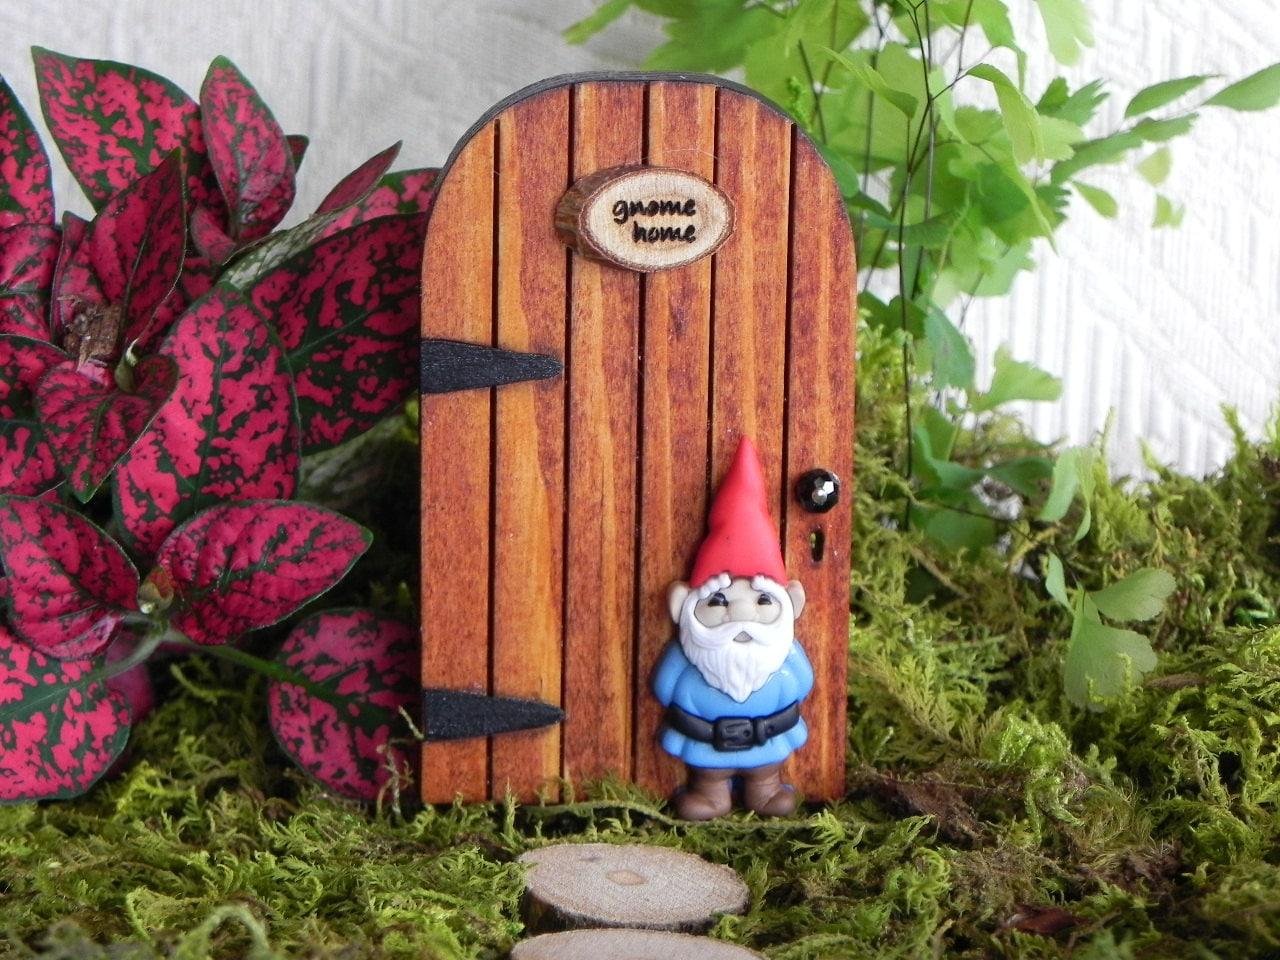 Gnome Garden: TINY Gnome Door For Miniature Garden Accessories For Terrarium